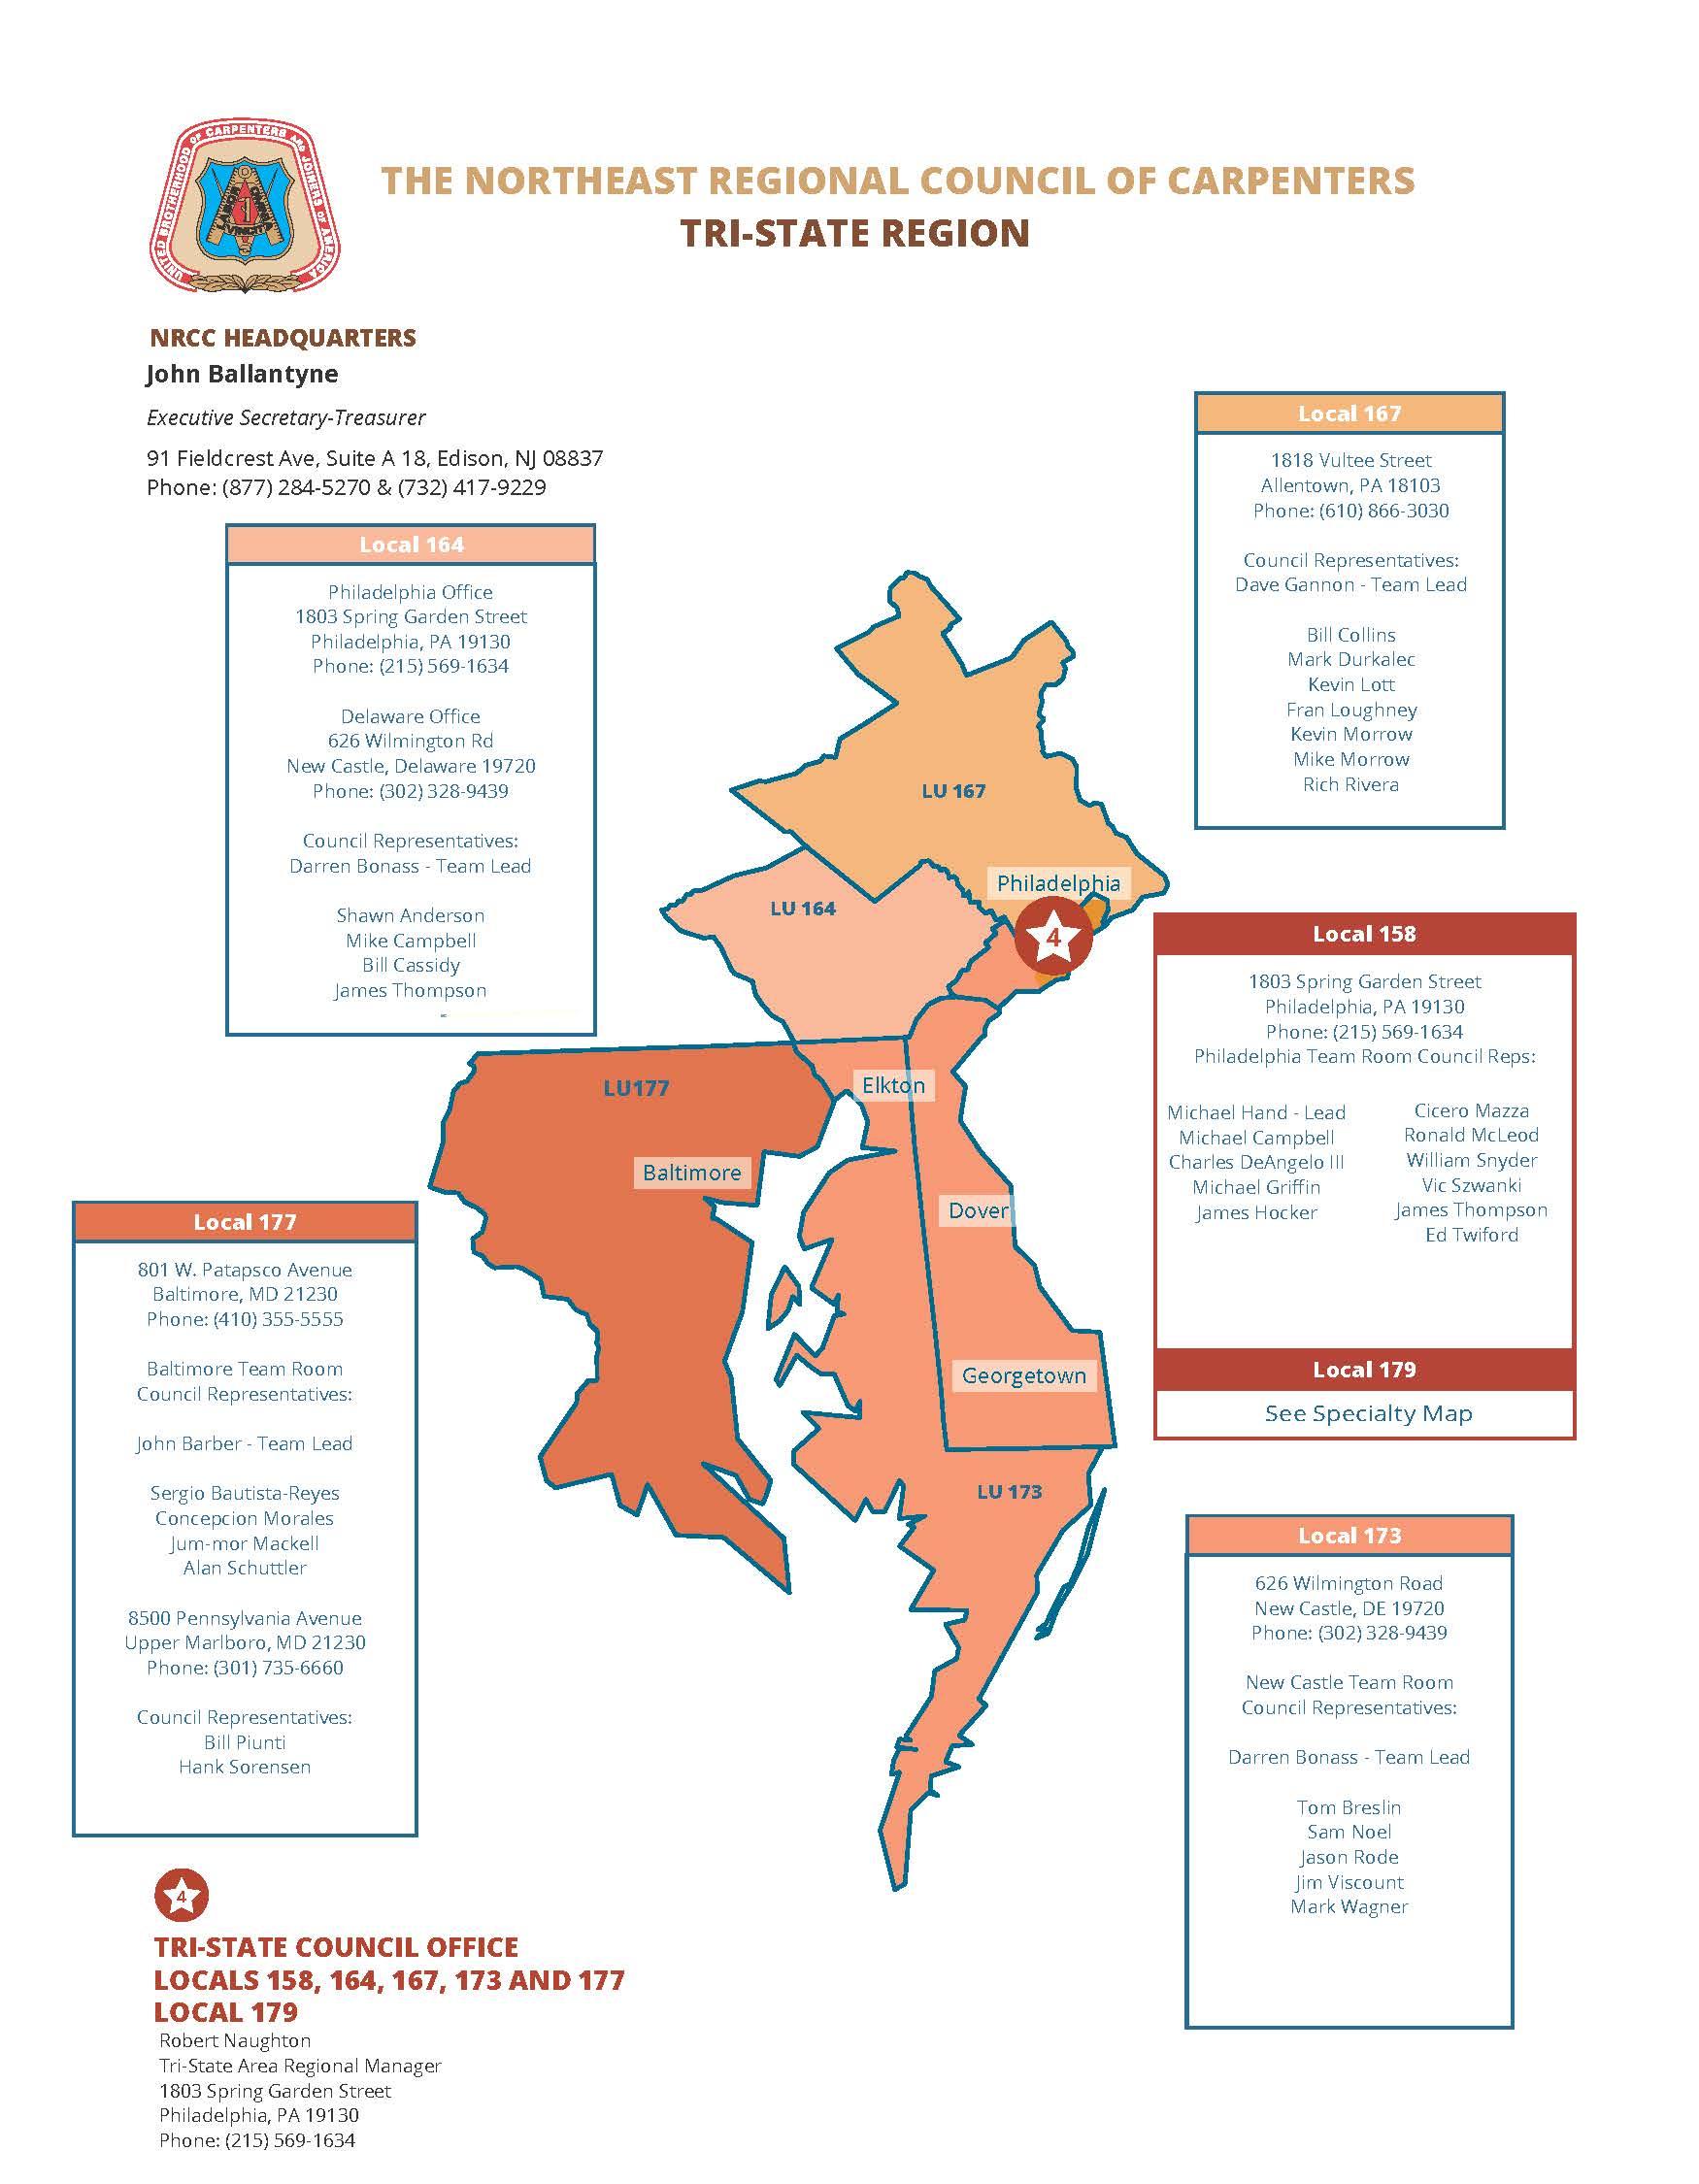 NRCC-Regional-Map-Tri-State-v5-_10.31.17.jpg